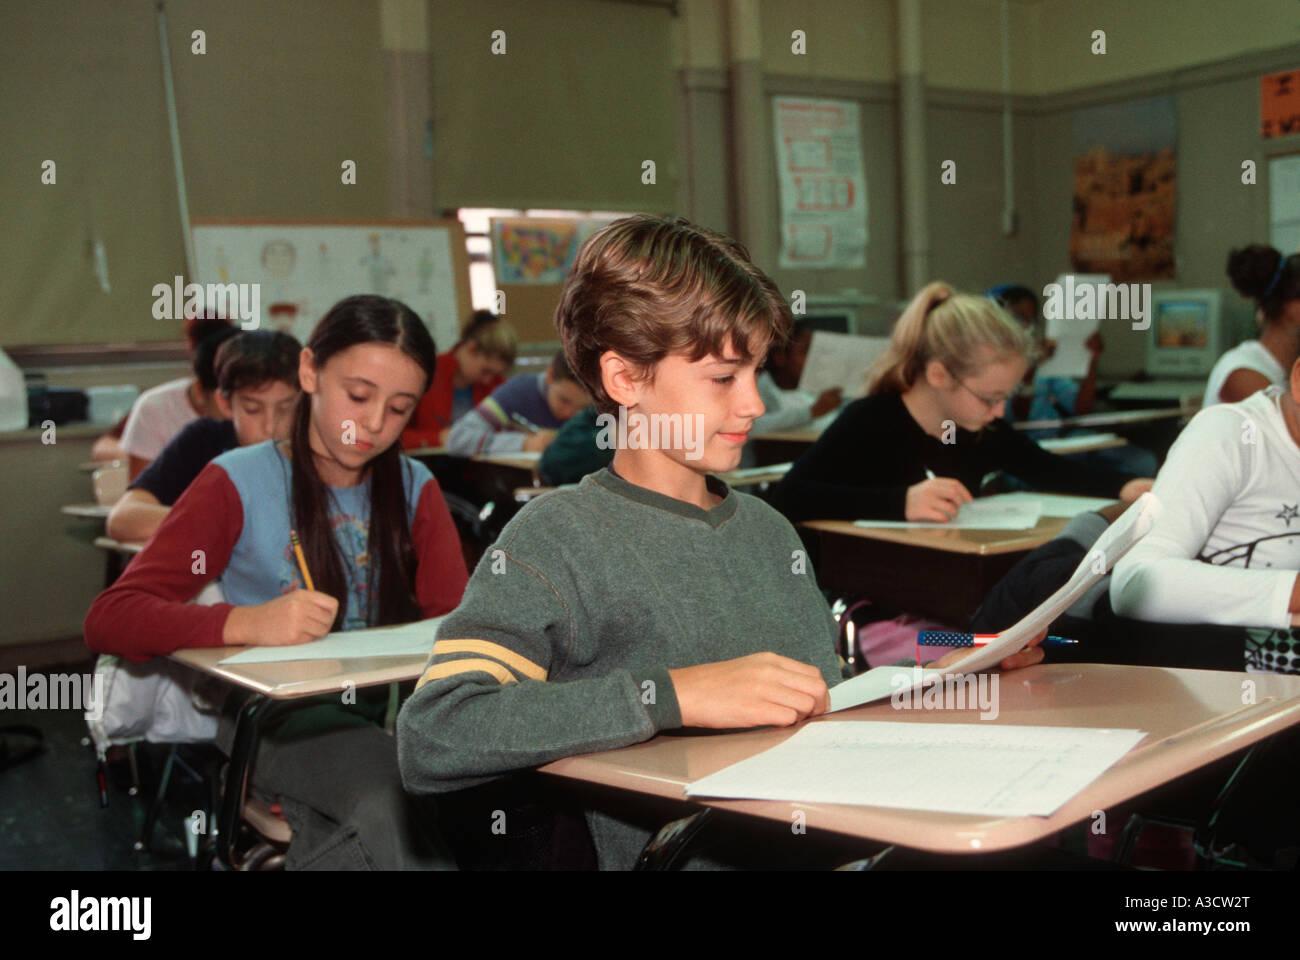 Junior High School Students Taking A Social Stu S Test